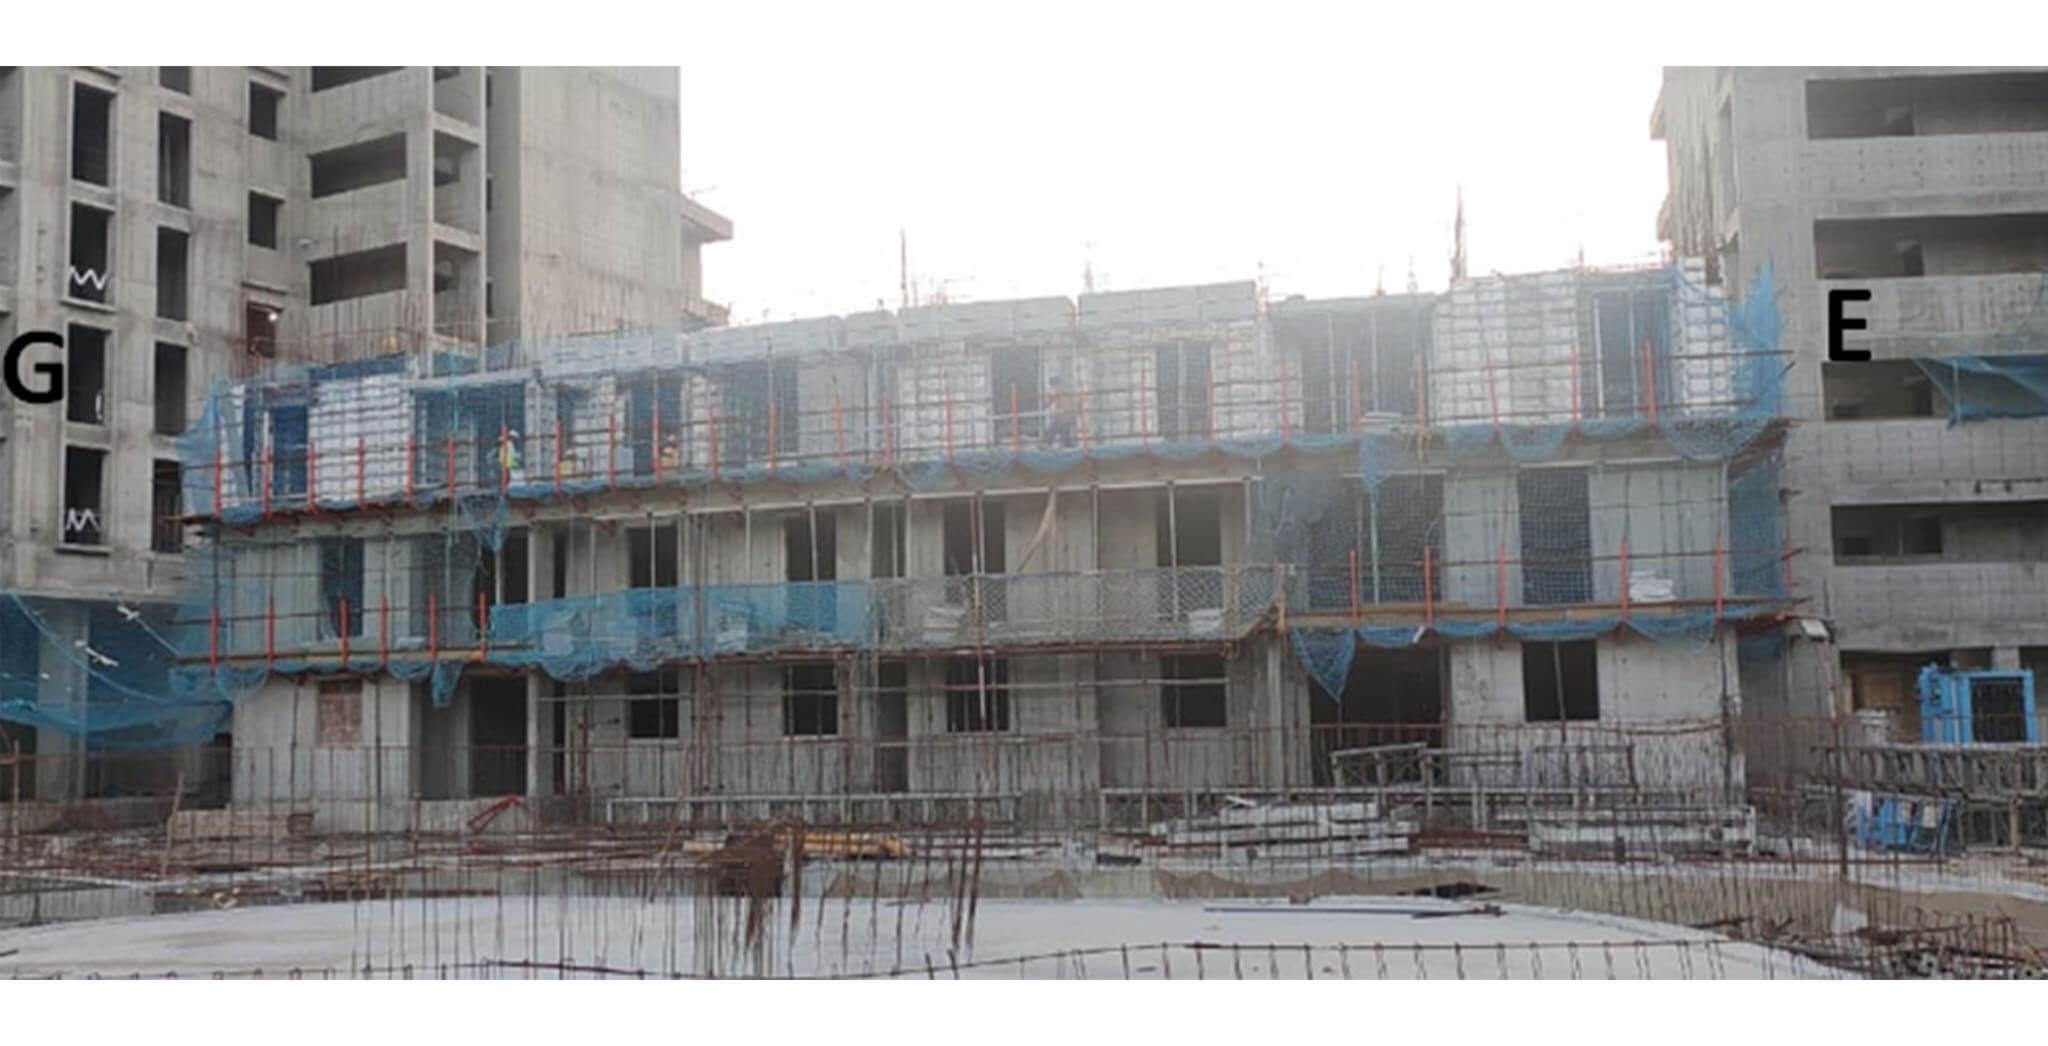 Jul 2020 - Serene: Low rise between G & E Towers—3rd Floor slab work under progress.